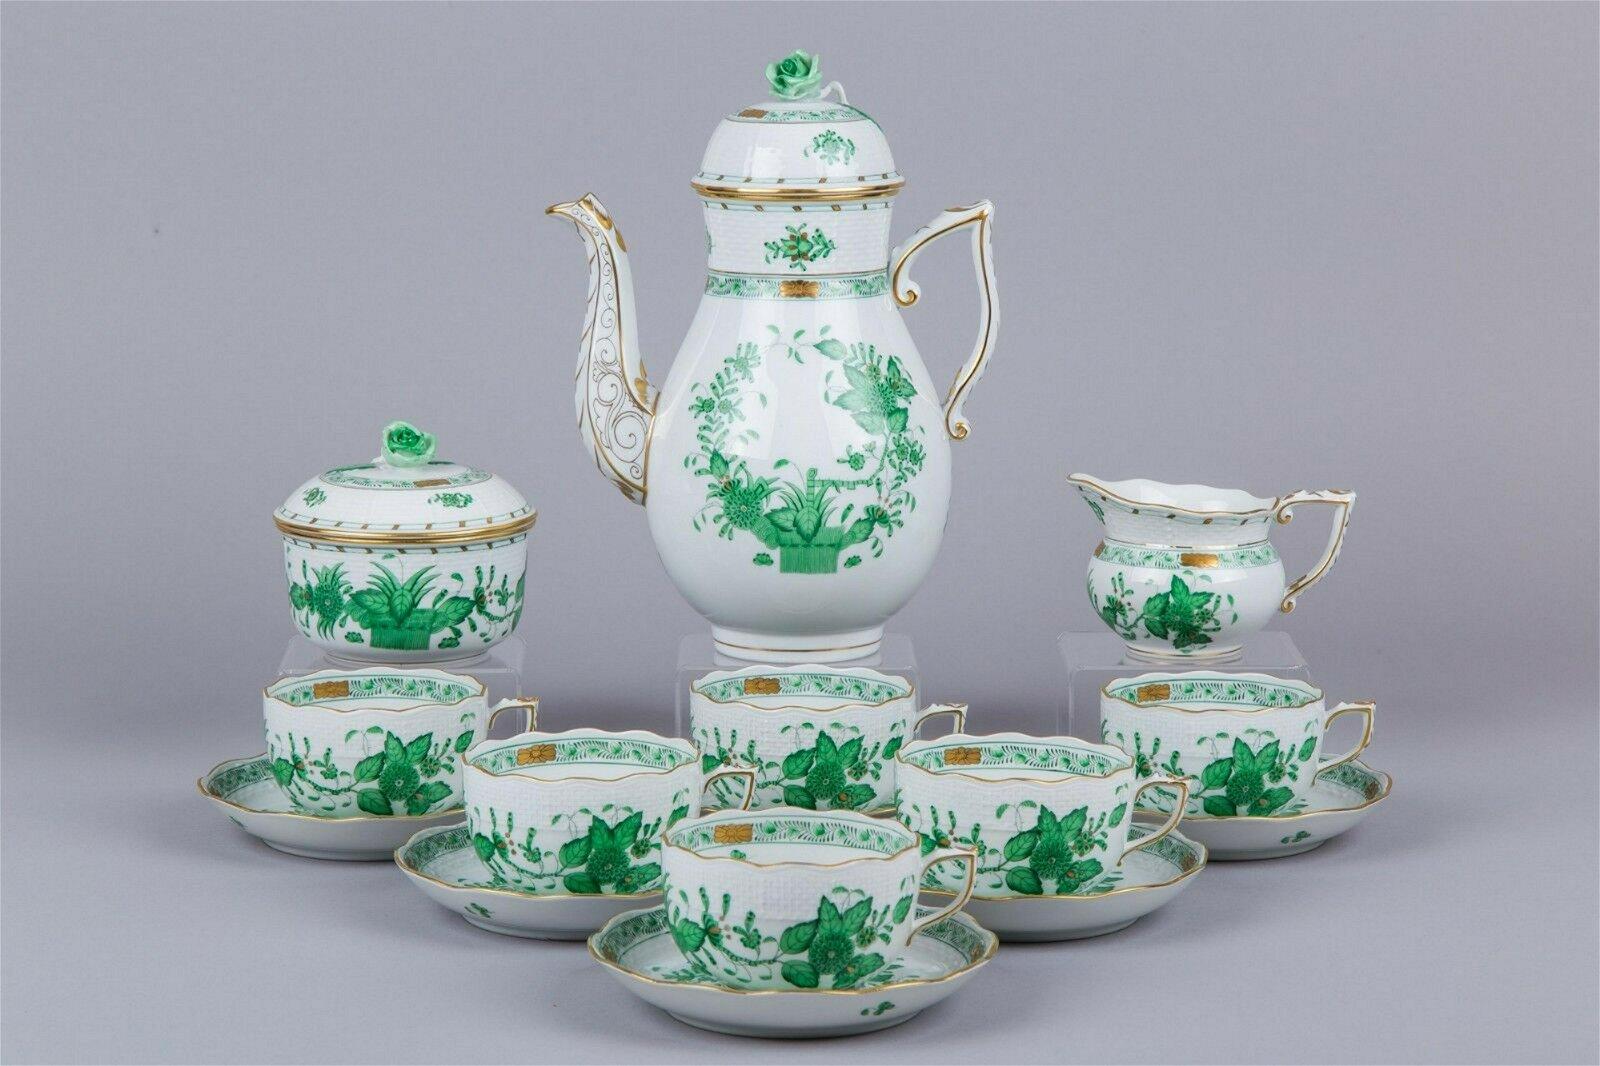 Herend Indian Basket Green Tea Set for Six People, 17